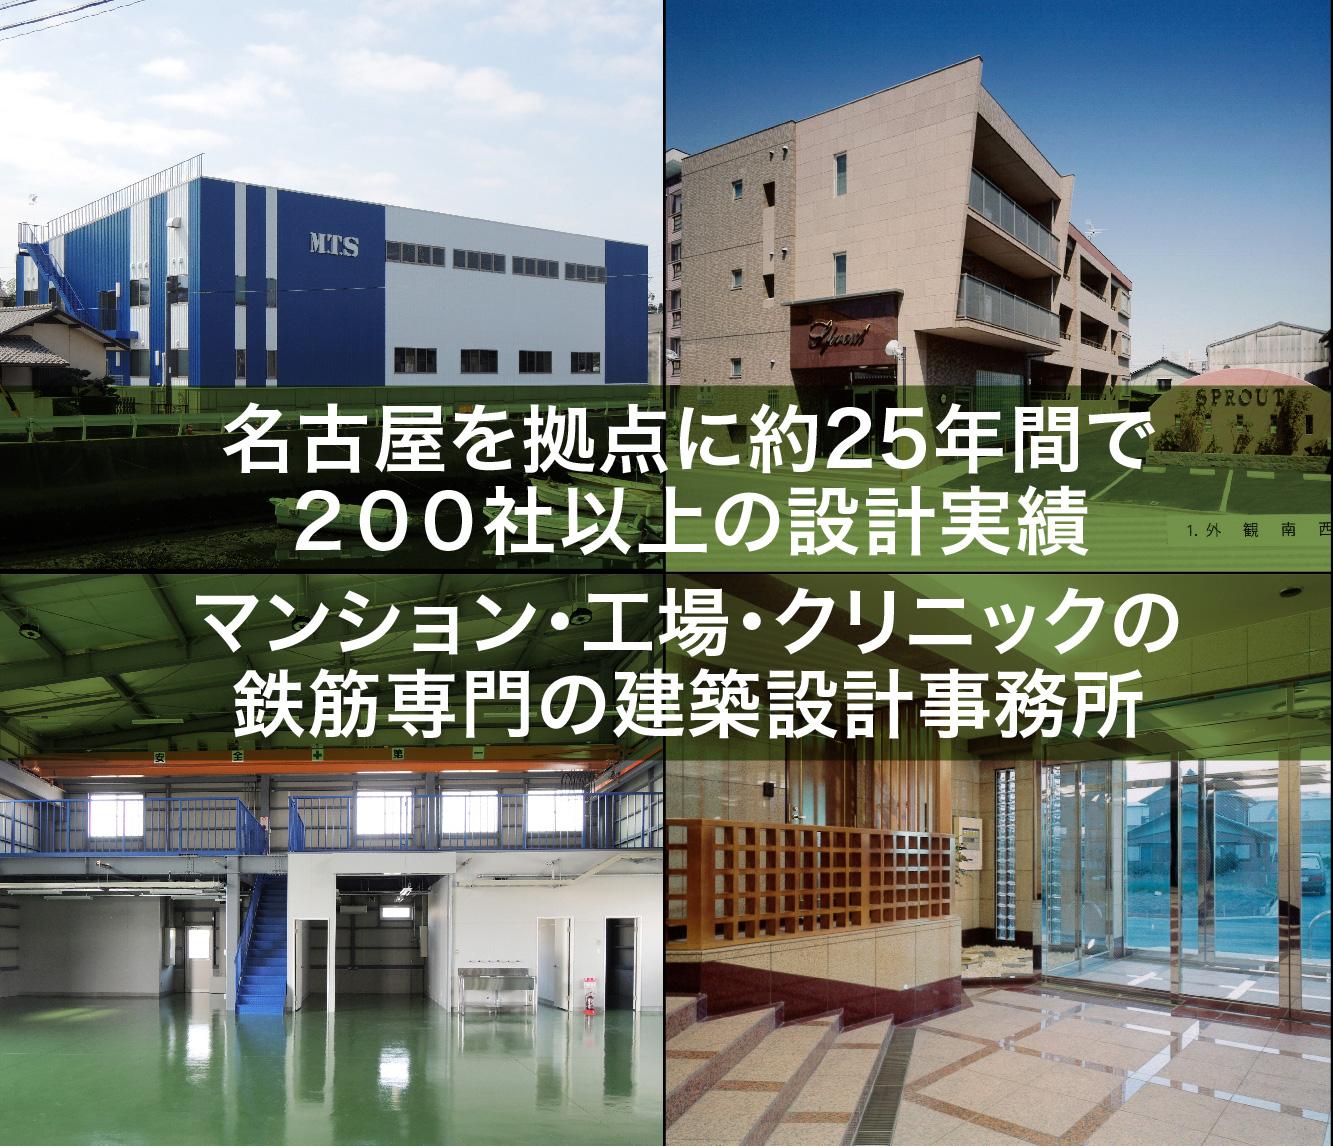 kei_WEB_TOP_320×460-01.jpg